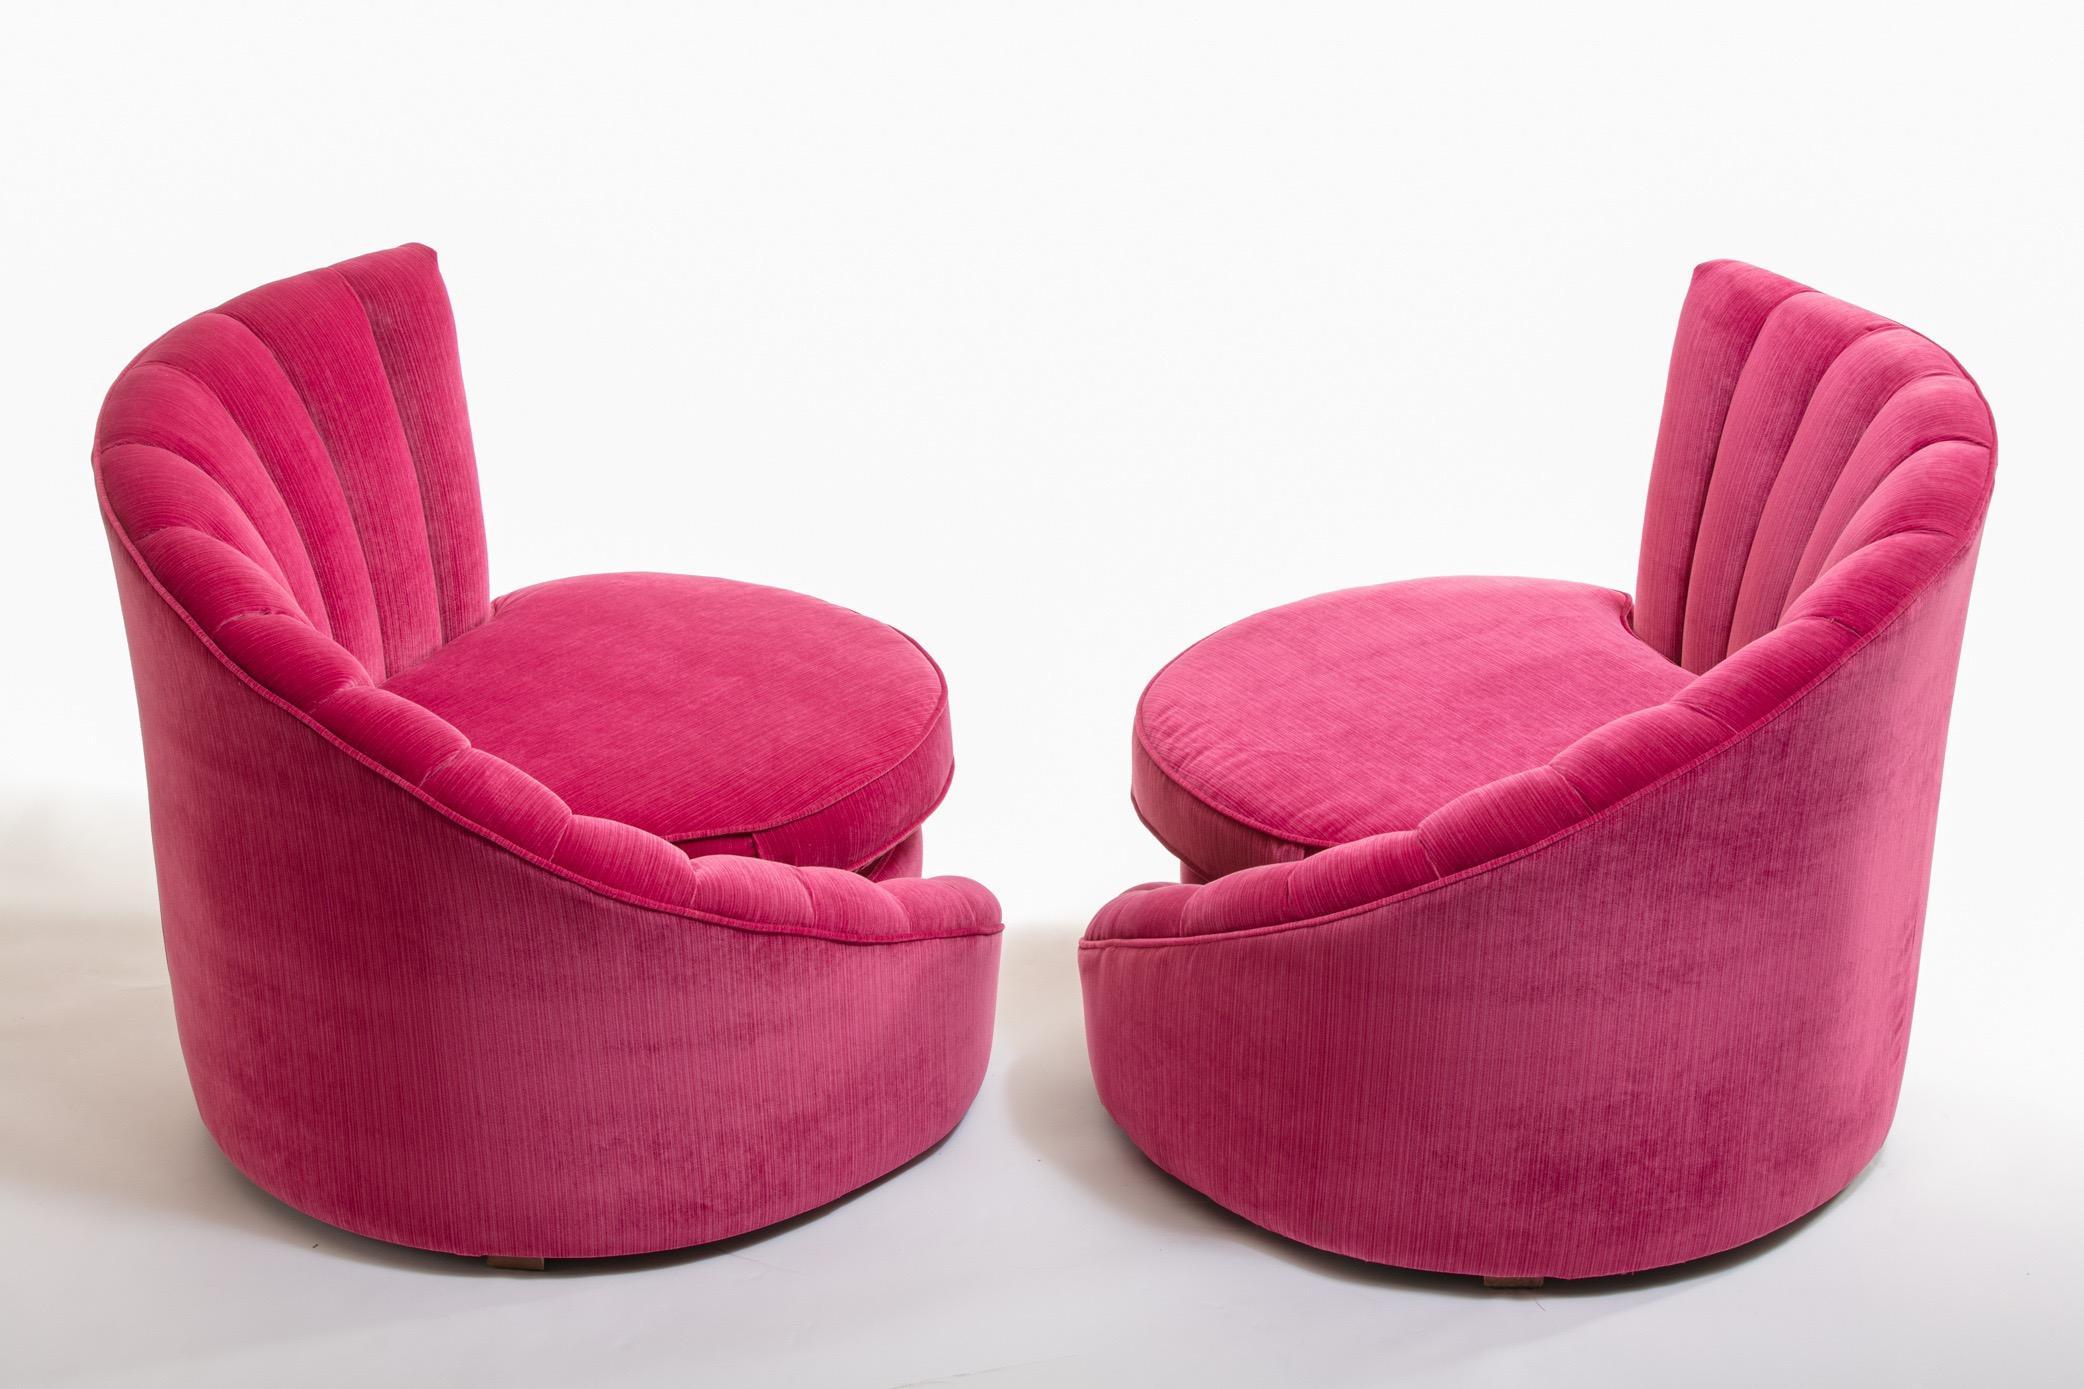 Pair Of Hollywood Regency Asymmetrical Slipper Chairs In Hot